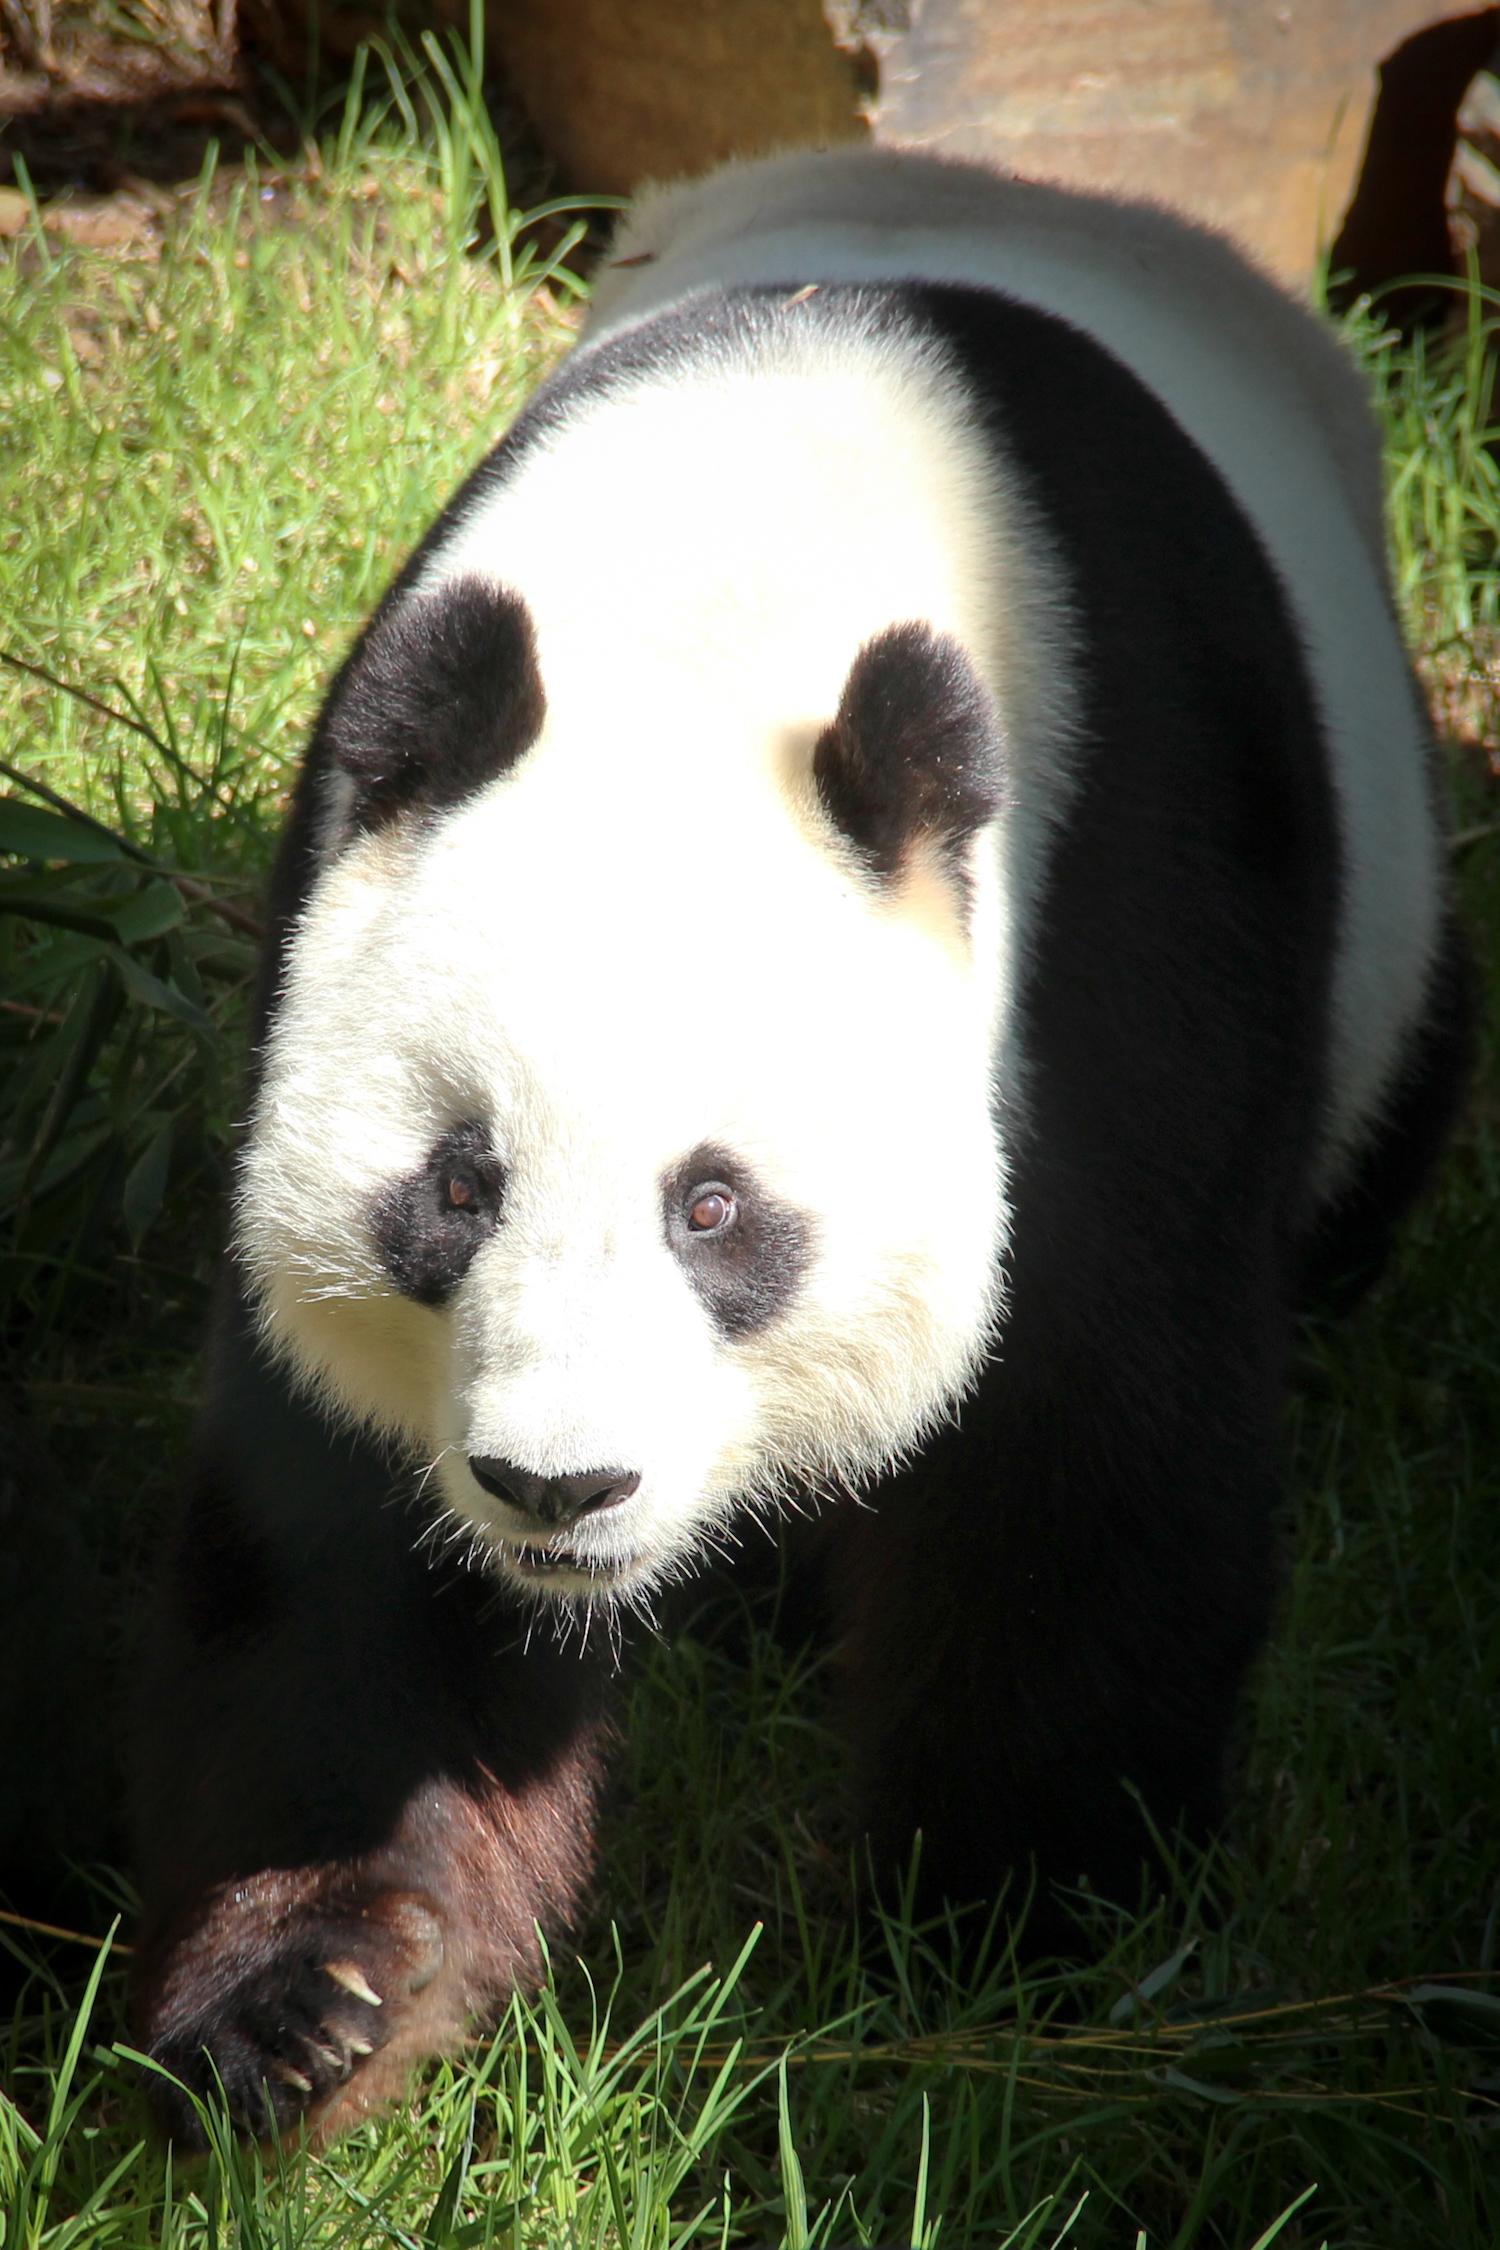 Giant Panda Cubs Playing Images of Pandas – W...